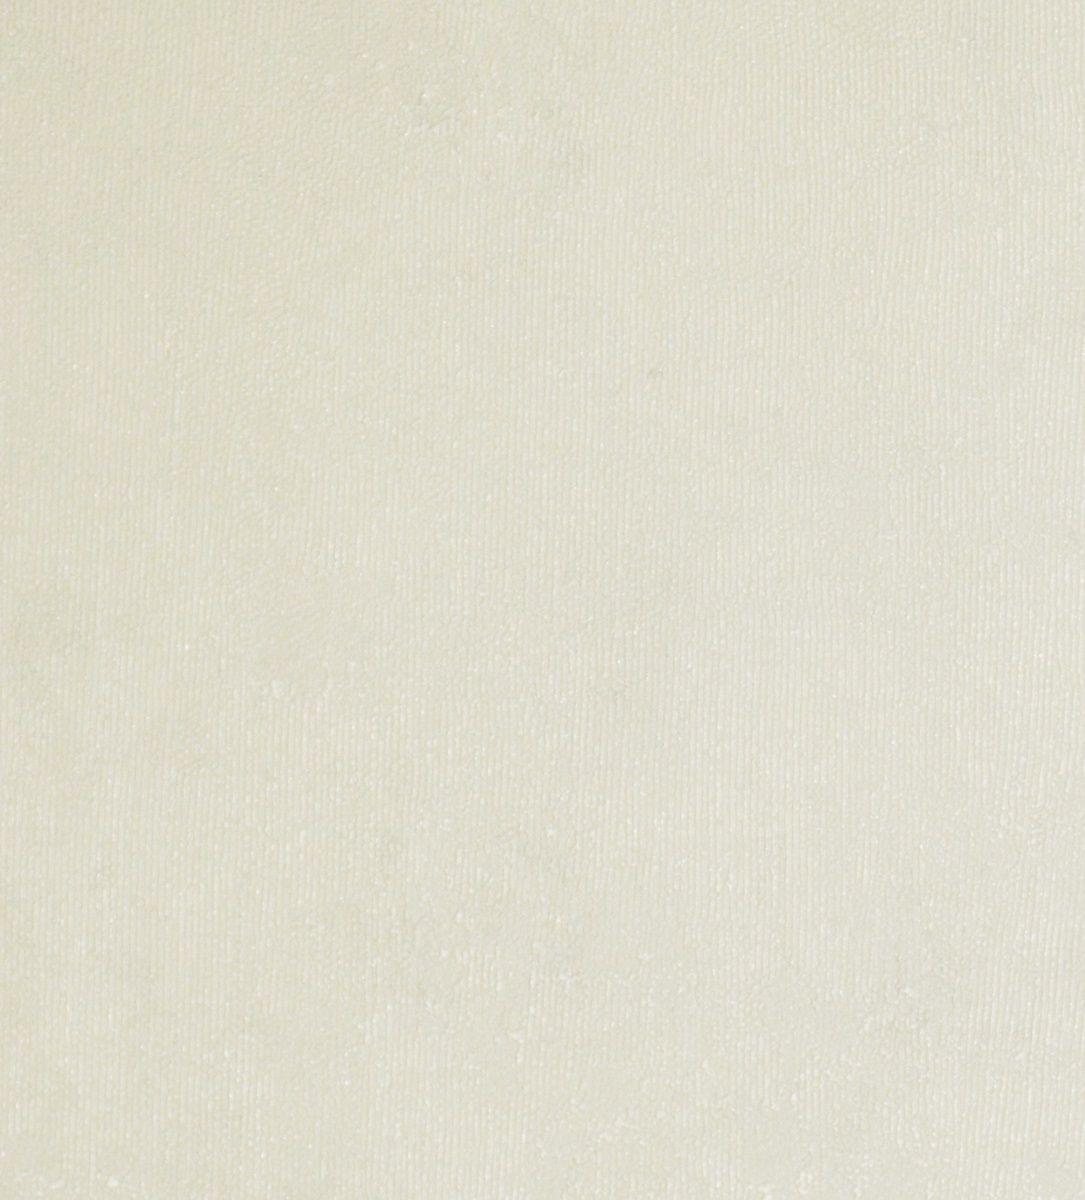 Обои Ideco Элегия фон (арт.105705) 1,06*10мОбои<br><br><br>Артикул: 105705<br>Бренд: Ideco<br>Мин. количество для заказа: 6<br>Страна-изготовитель: Бельгия<br>Количество штук в упаковке: 6<br>Количество рулонов в упаковке: 6<br>Коллекция (серия) обоев: Элегия<br>Ширина рулона (м): 1,06<br>Длина рулона (м): 10<br>Количество м2 в рулоне: 10,6<br>Продажа товара кратно упаковке: Да